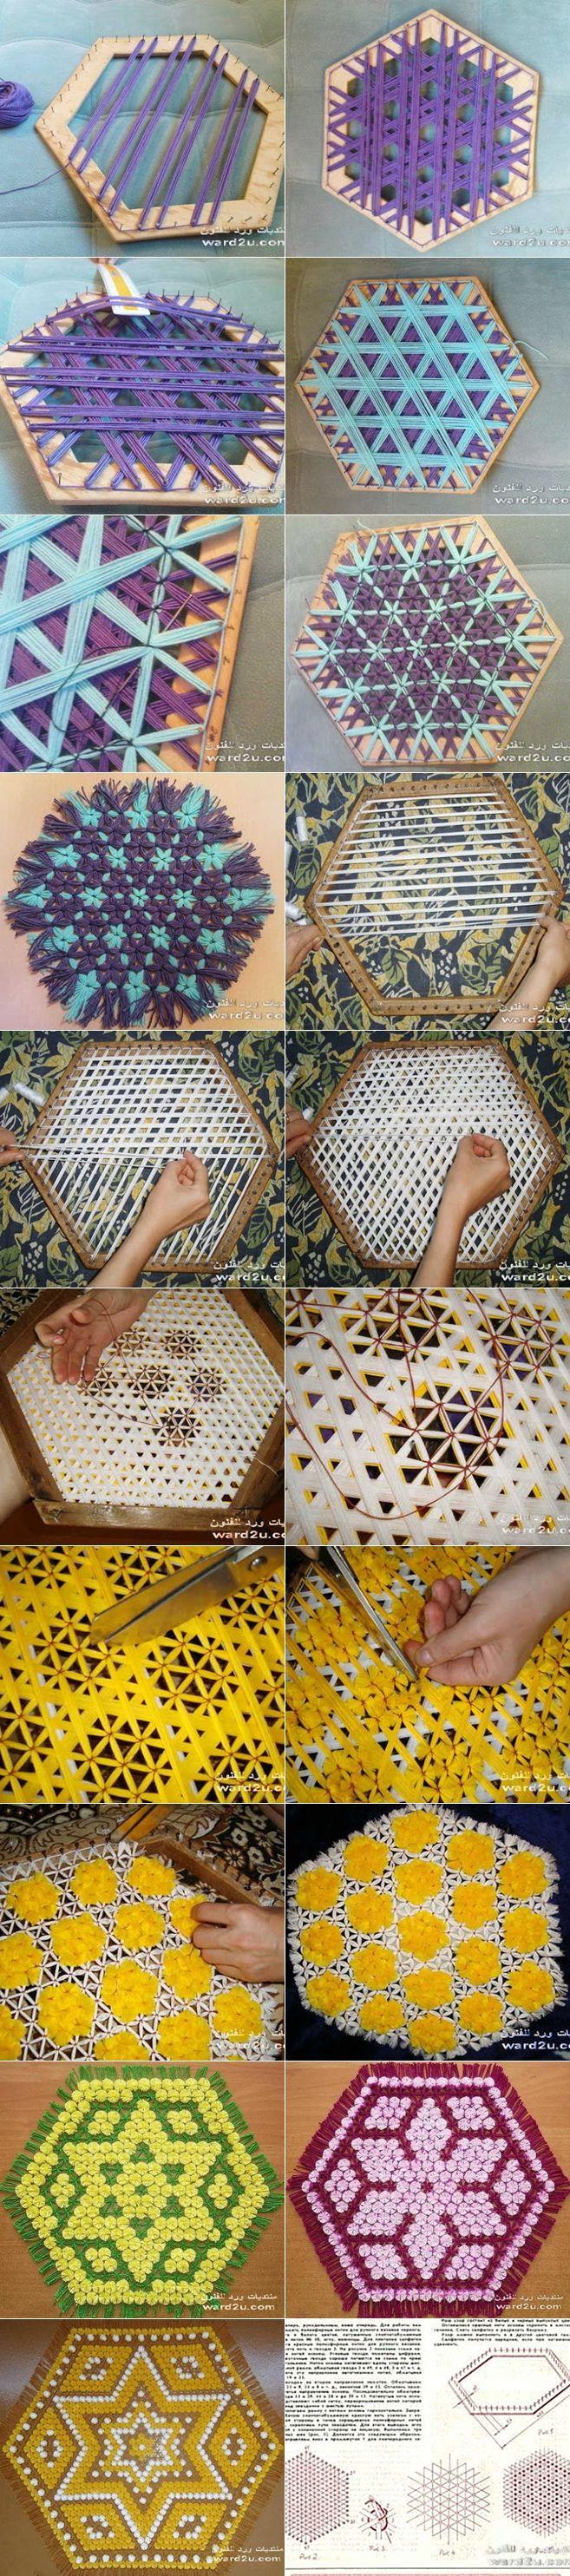 Hexagonal coaster tutorial